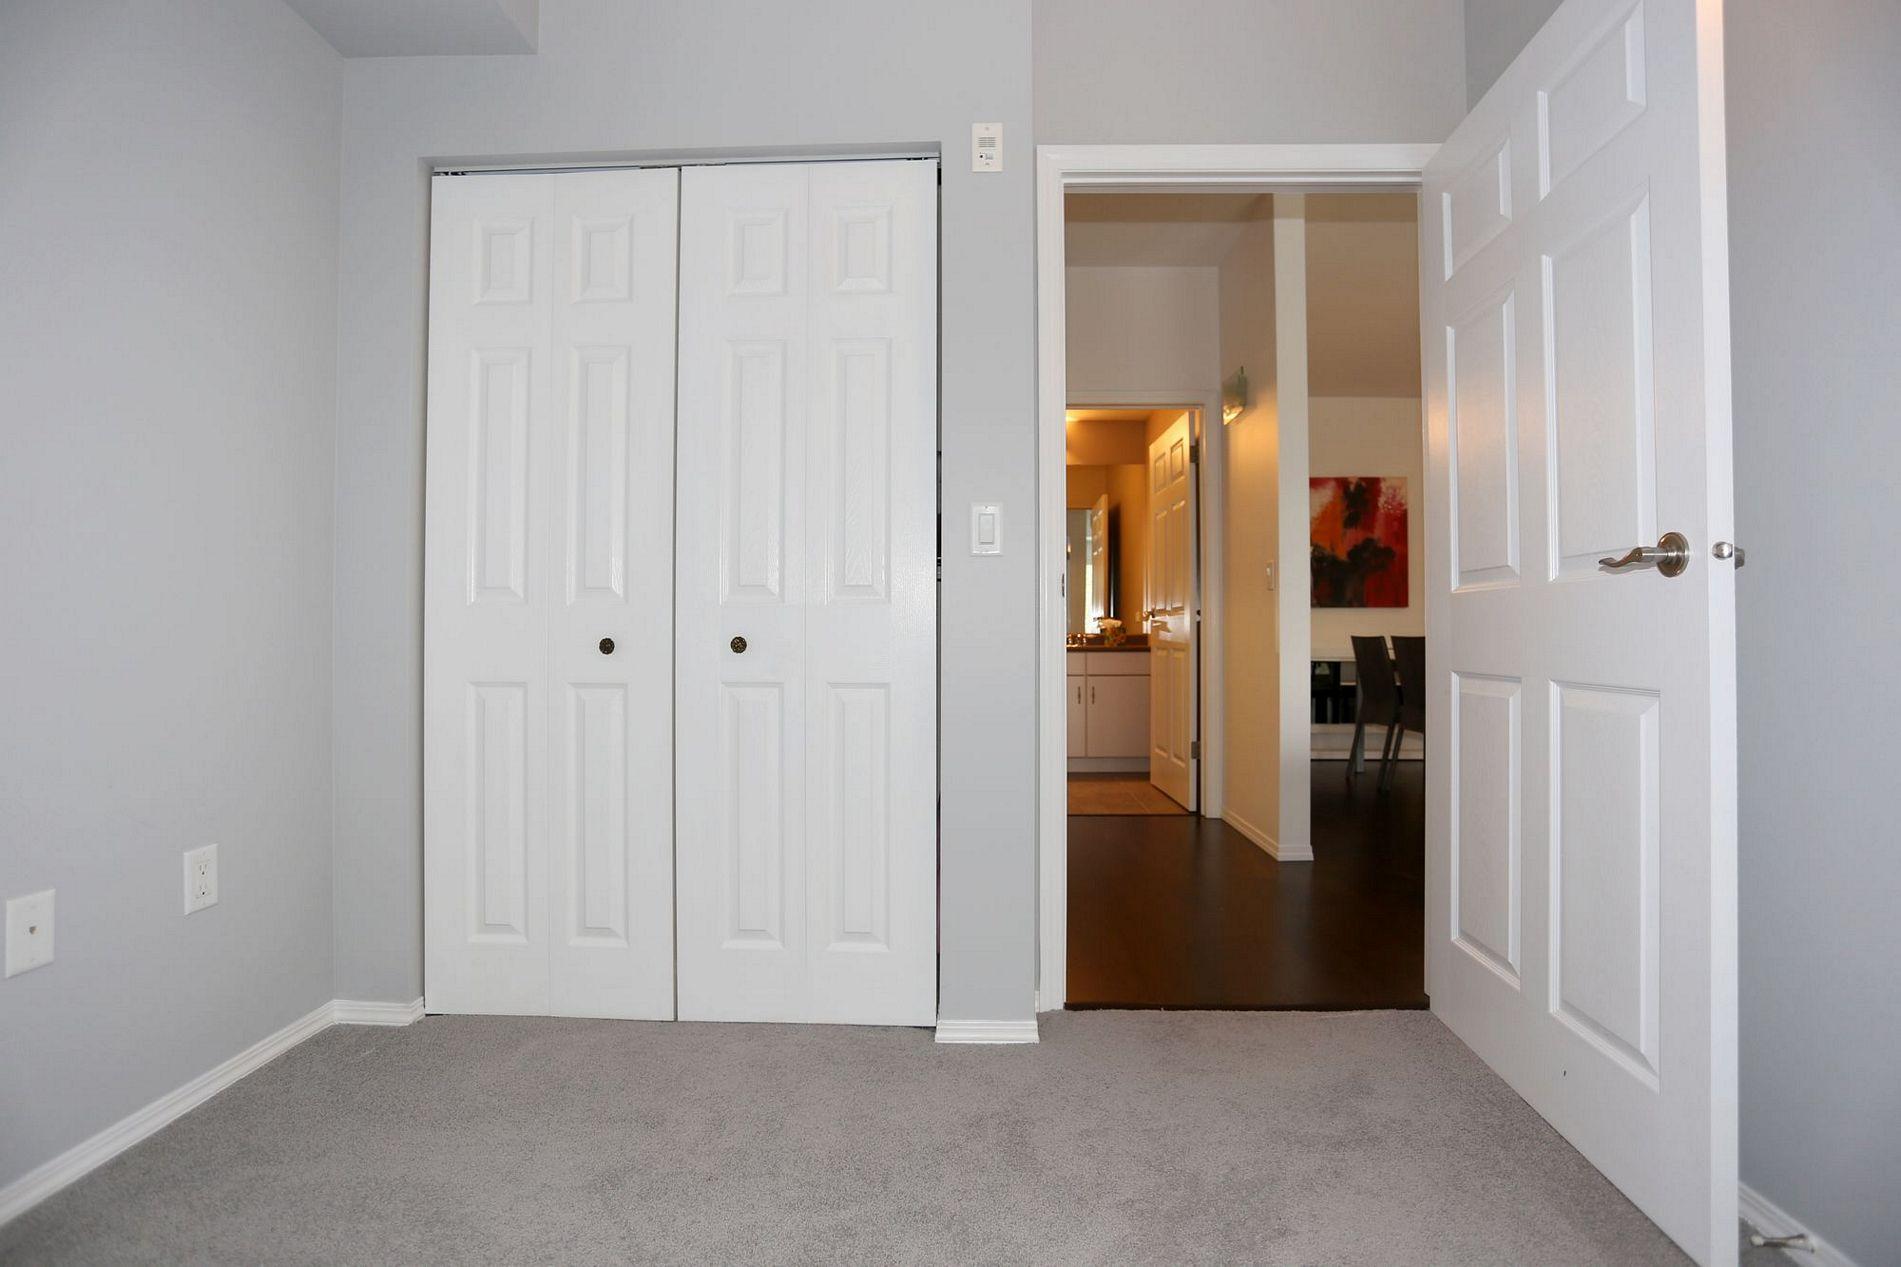 303e-1780 Grant Avenue, Winnipeg, Manitoba  R3N 2B9 - Photo 18 - 1721273